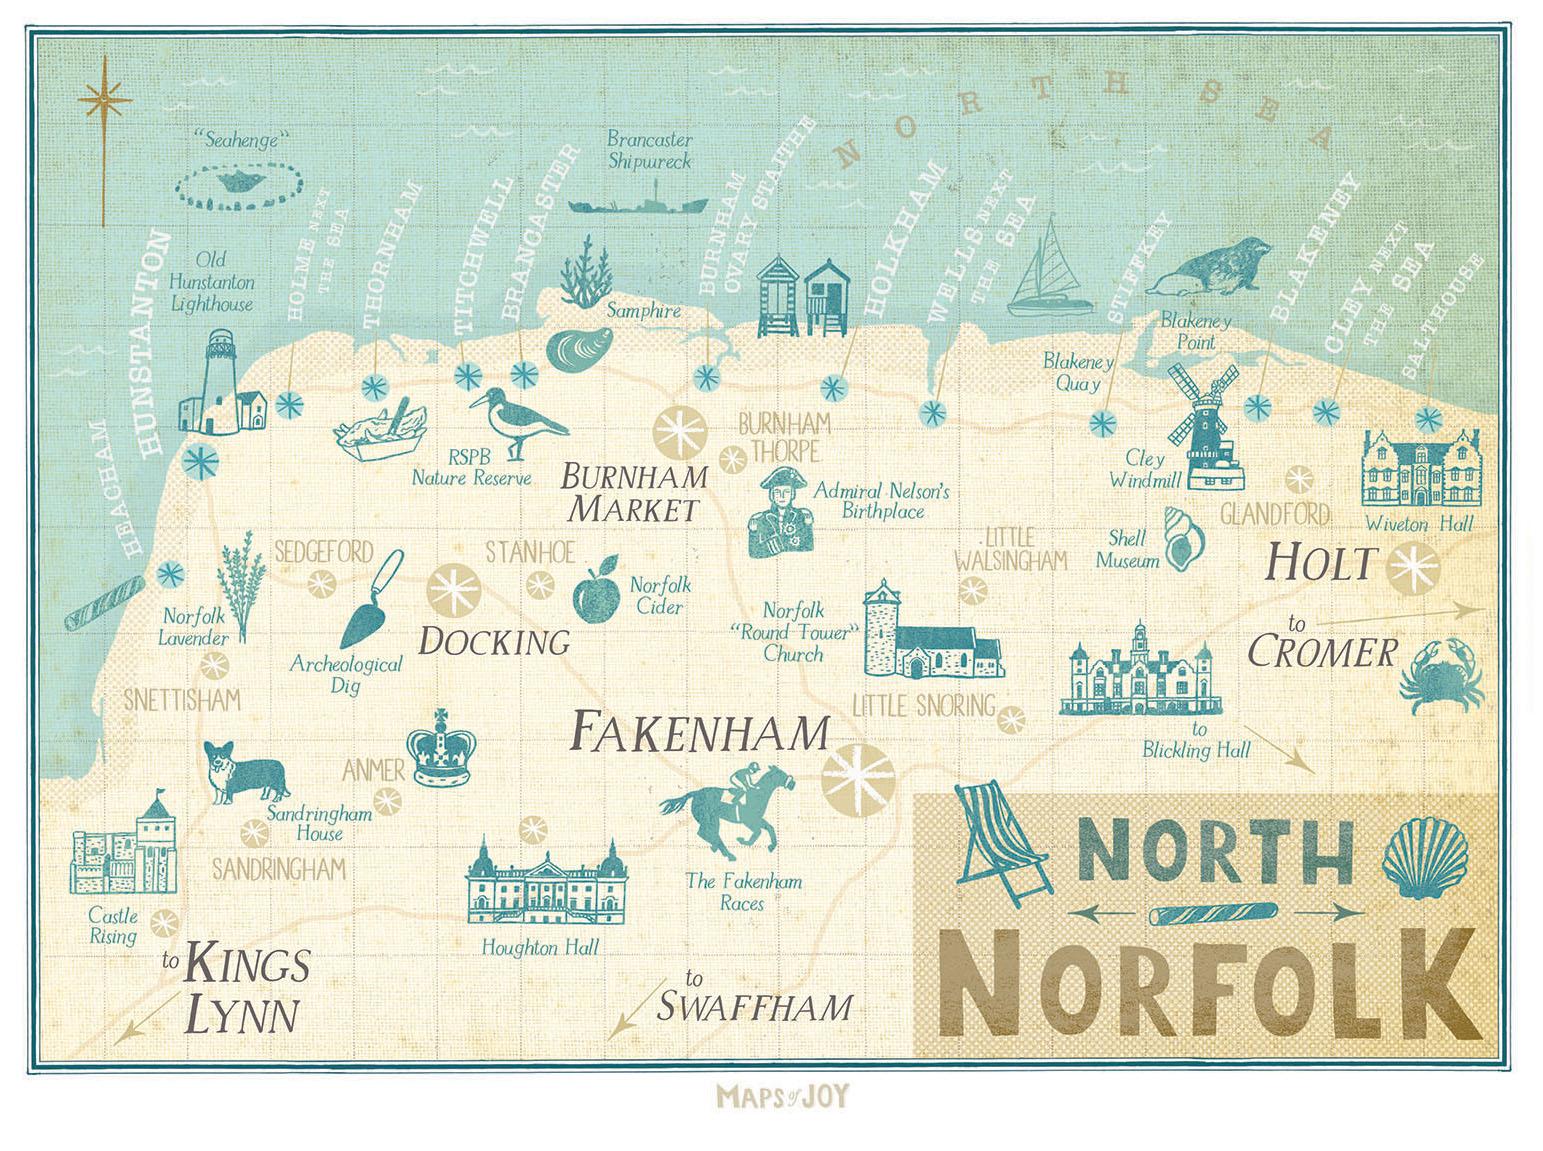 Norfolkblog